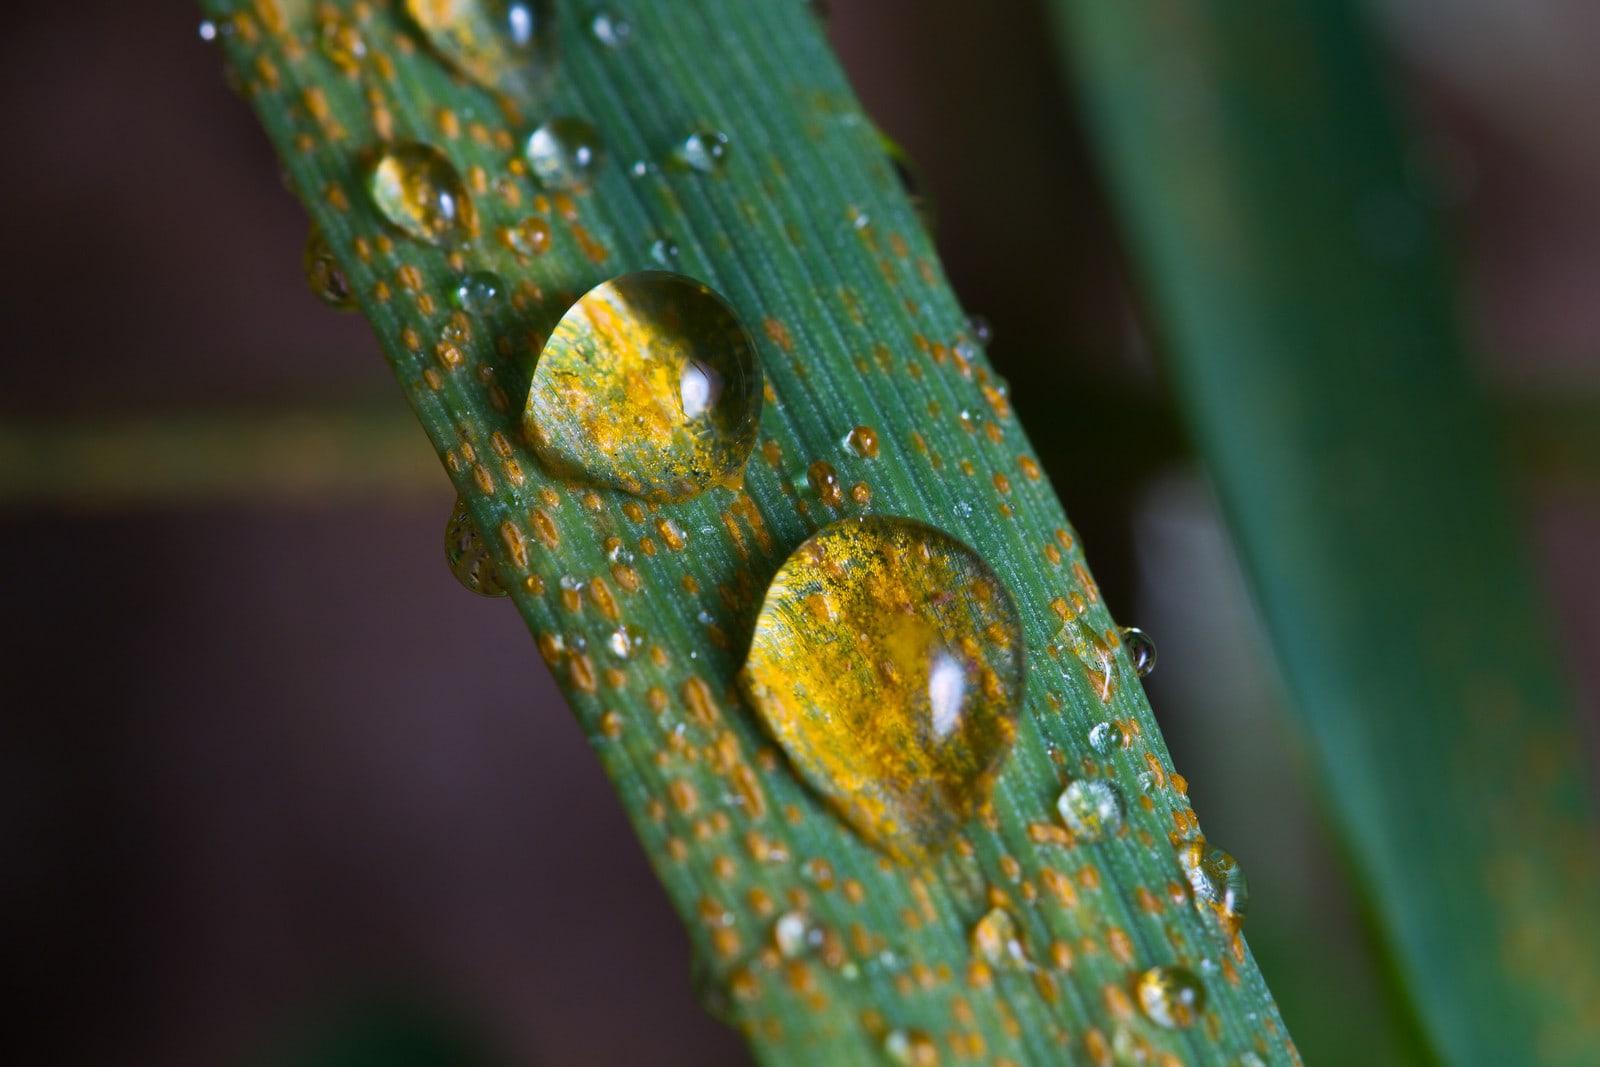 Rust resistant wheat